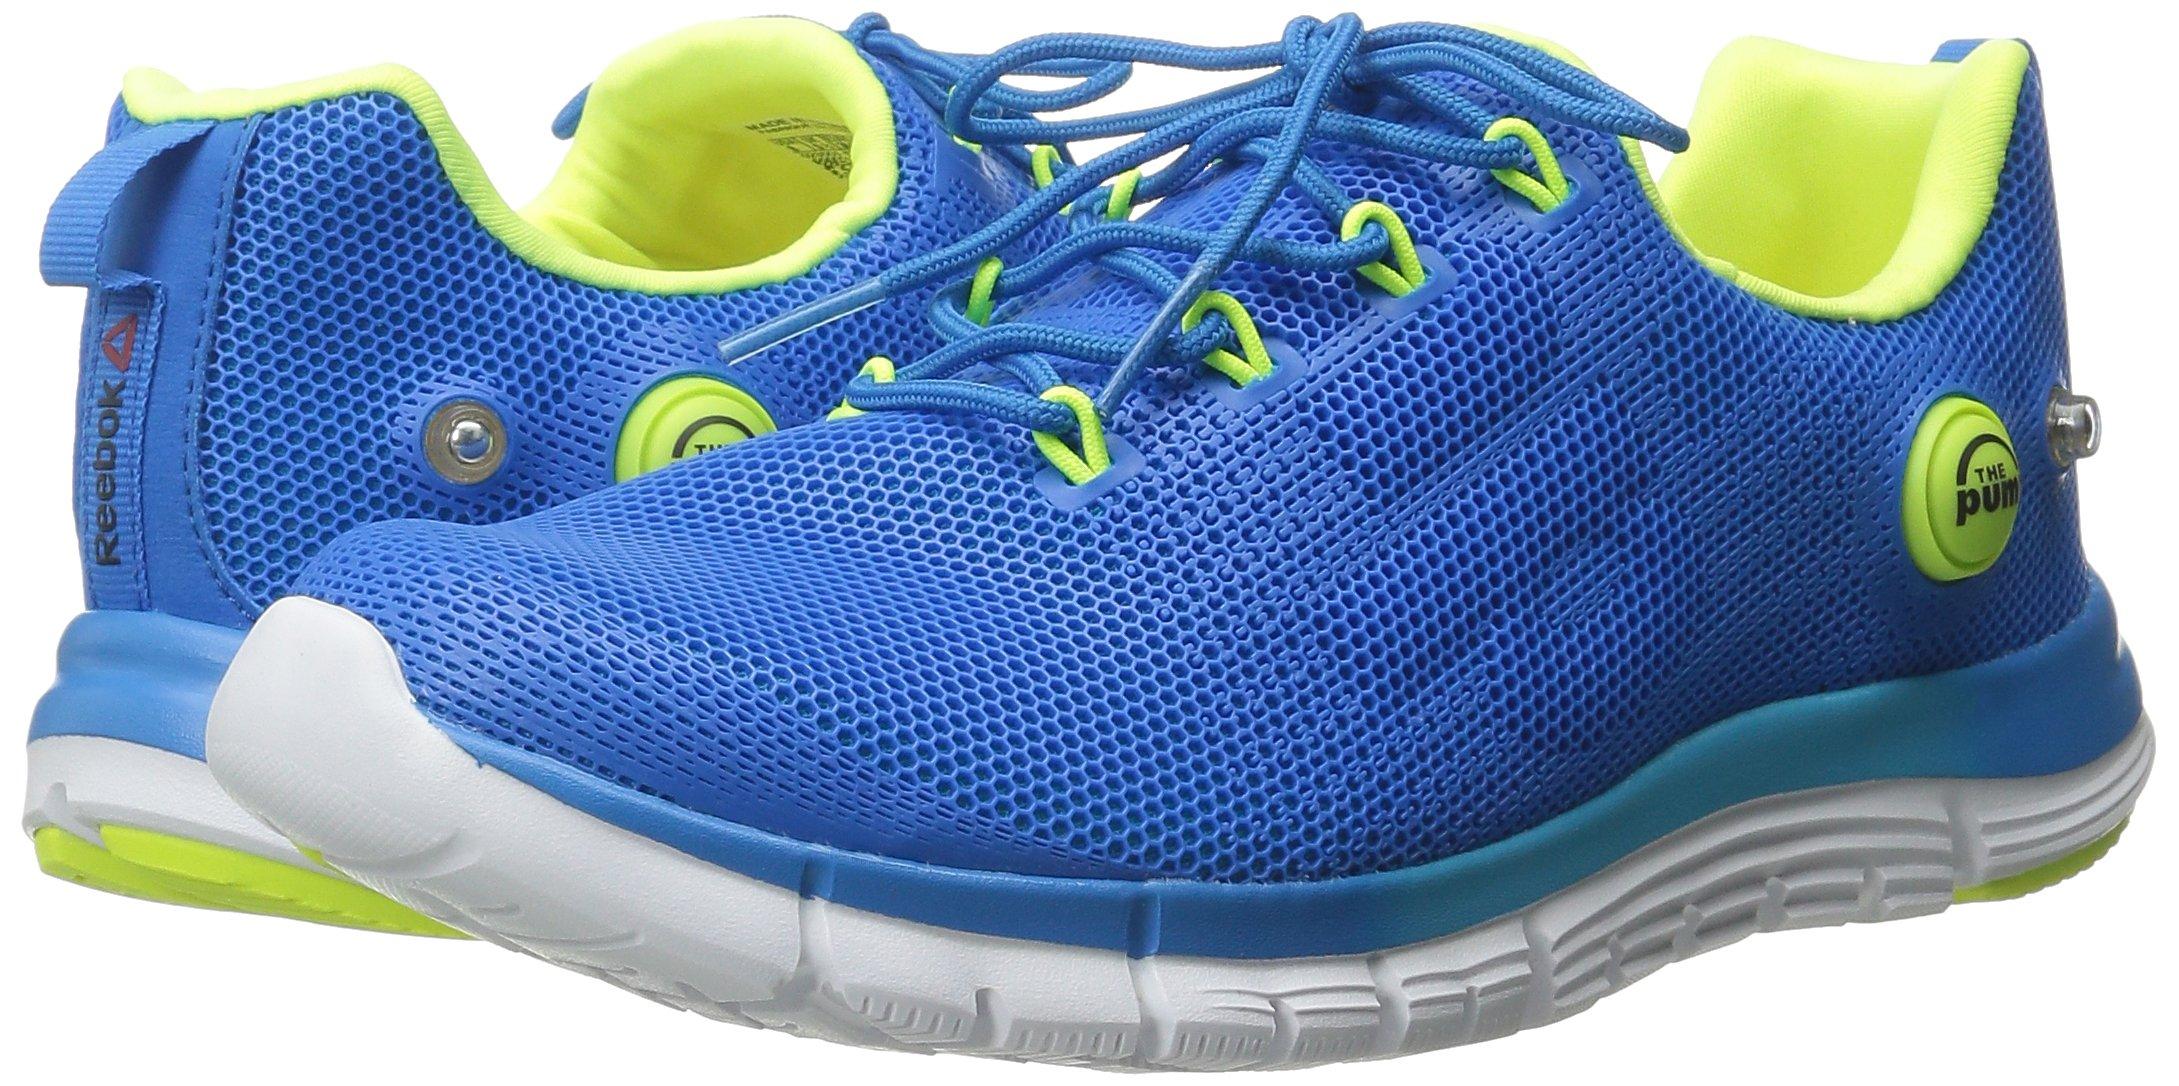 819lKIeVHiL - Reebok Women's Z Pump Fusion Polyurethane Running Shoe